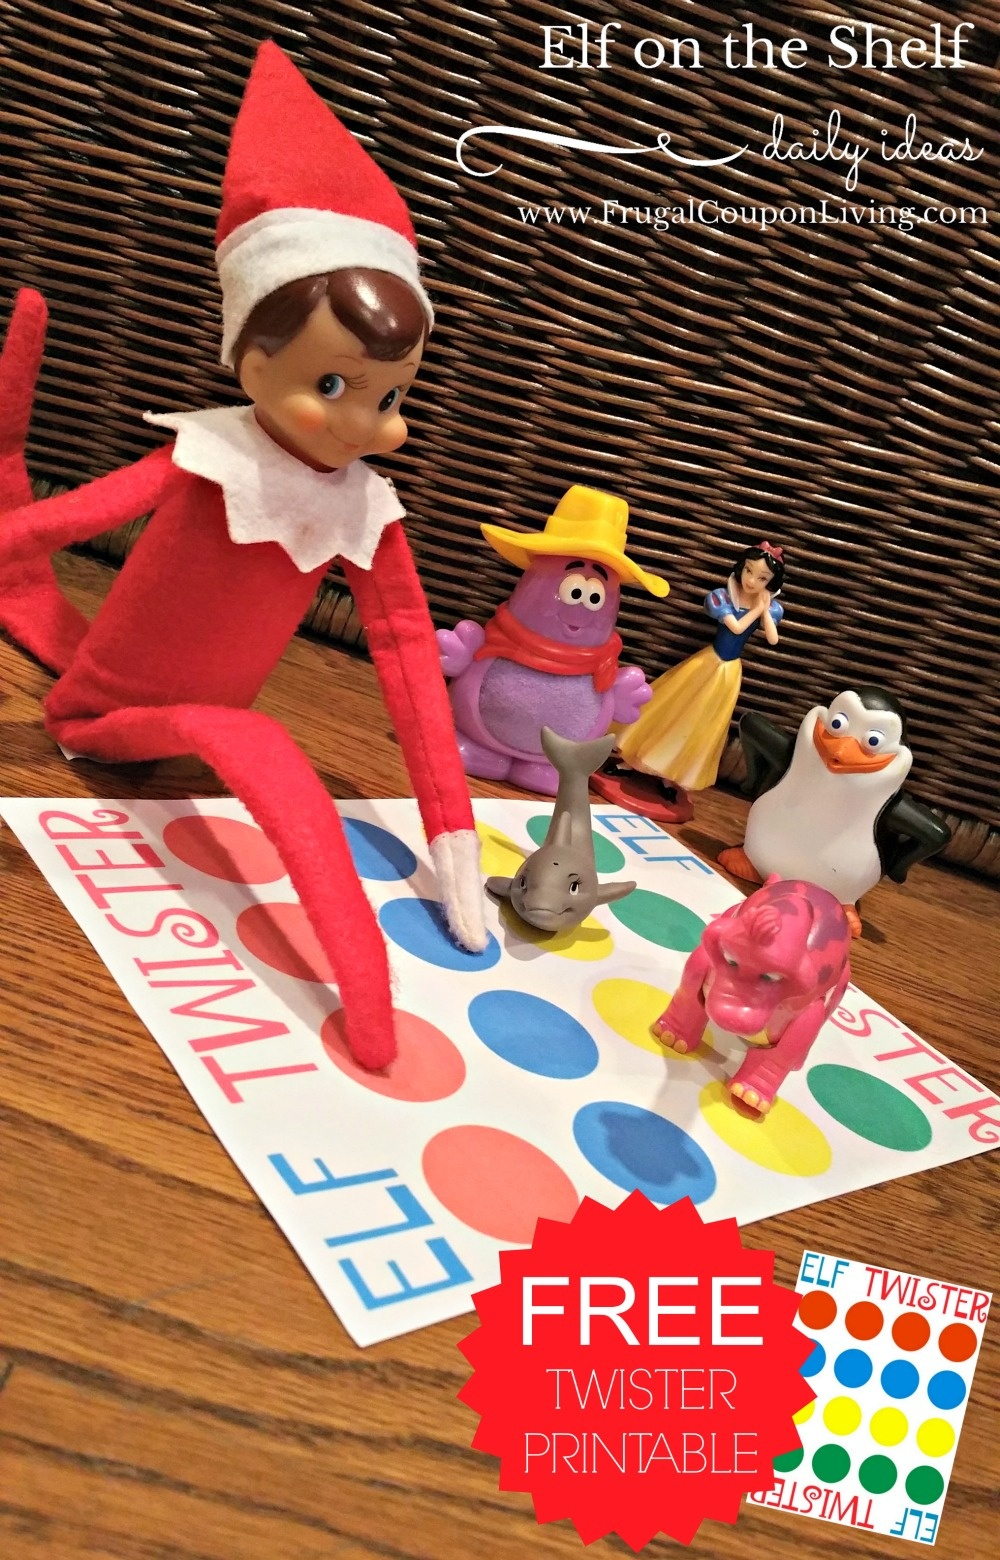 Elf On The Shelf Ideas | Elf Twister Printable - Elf On The Shelf Free Printable Ideas